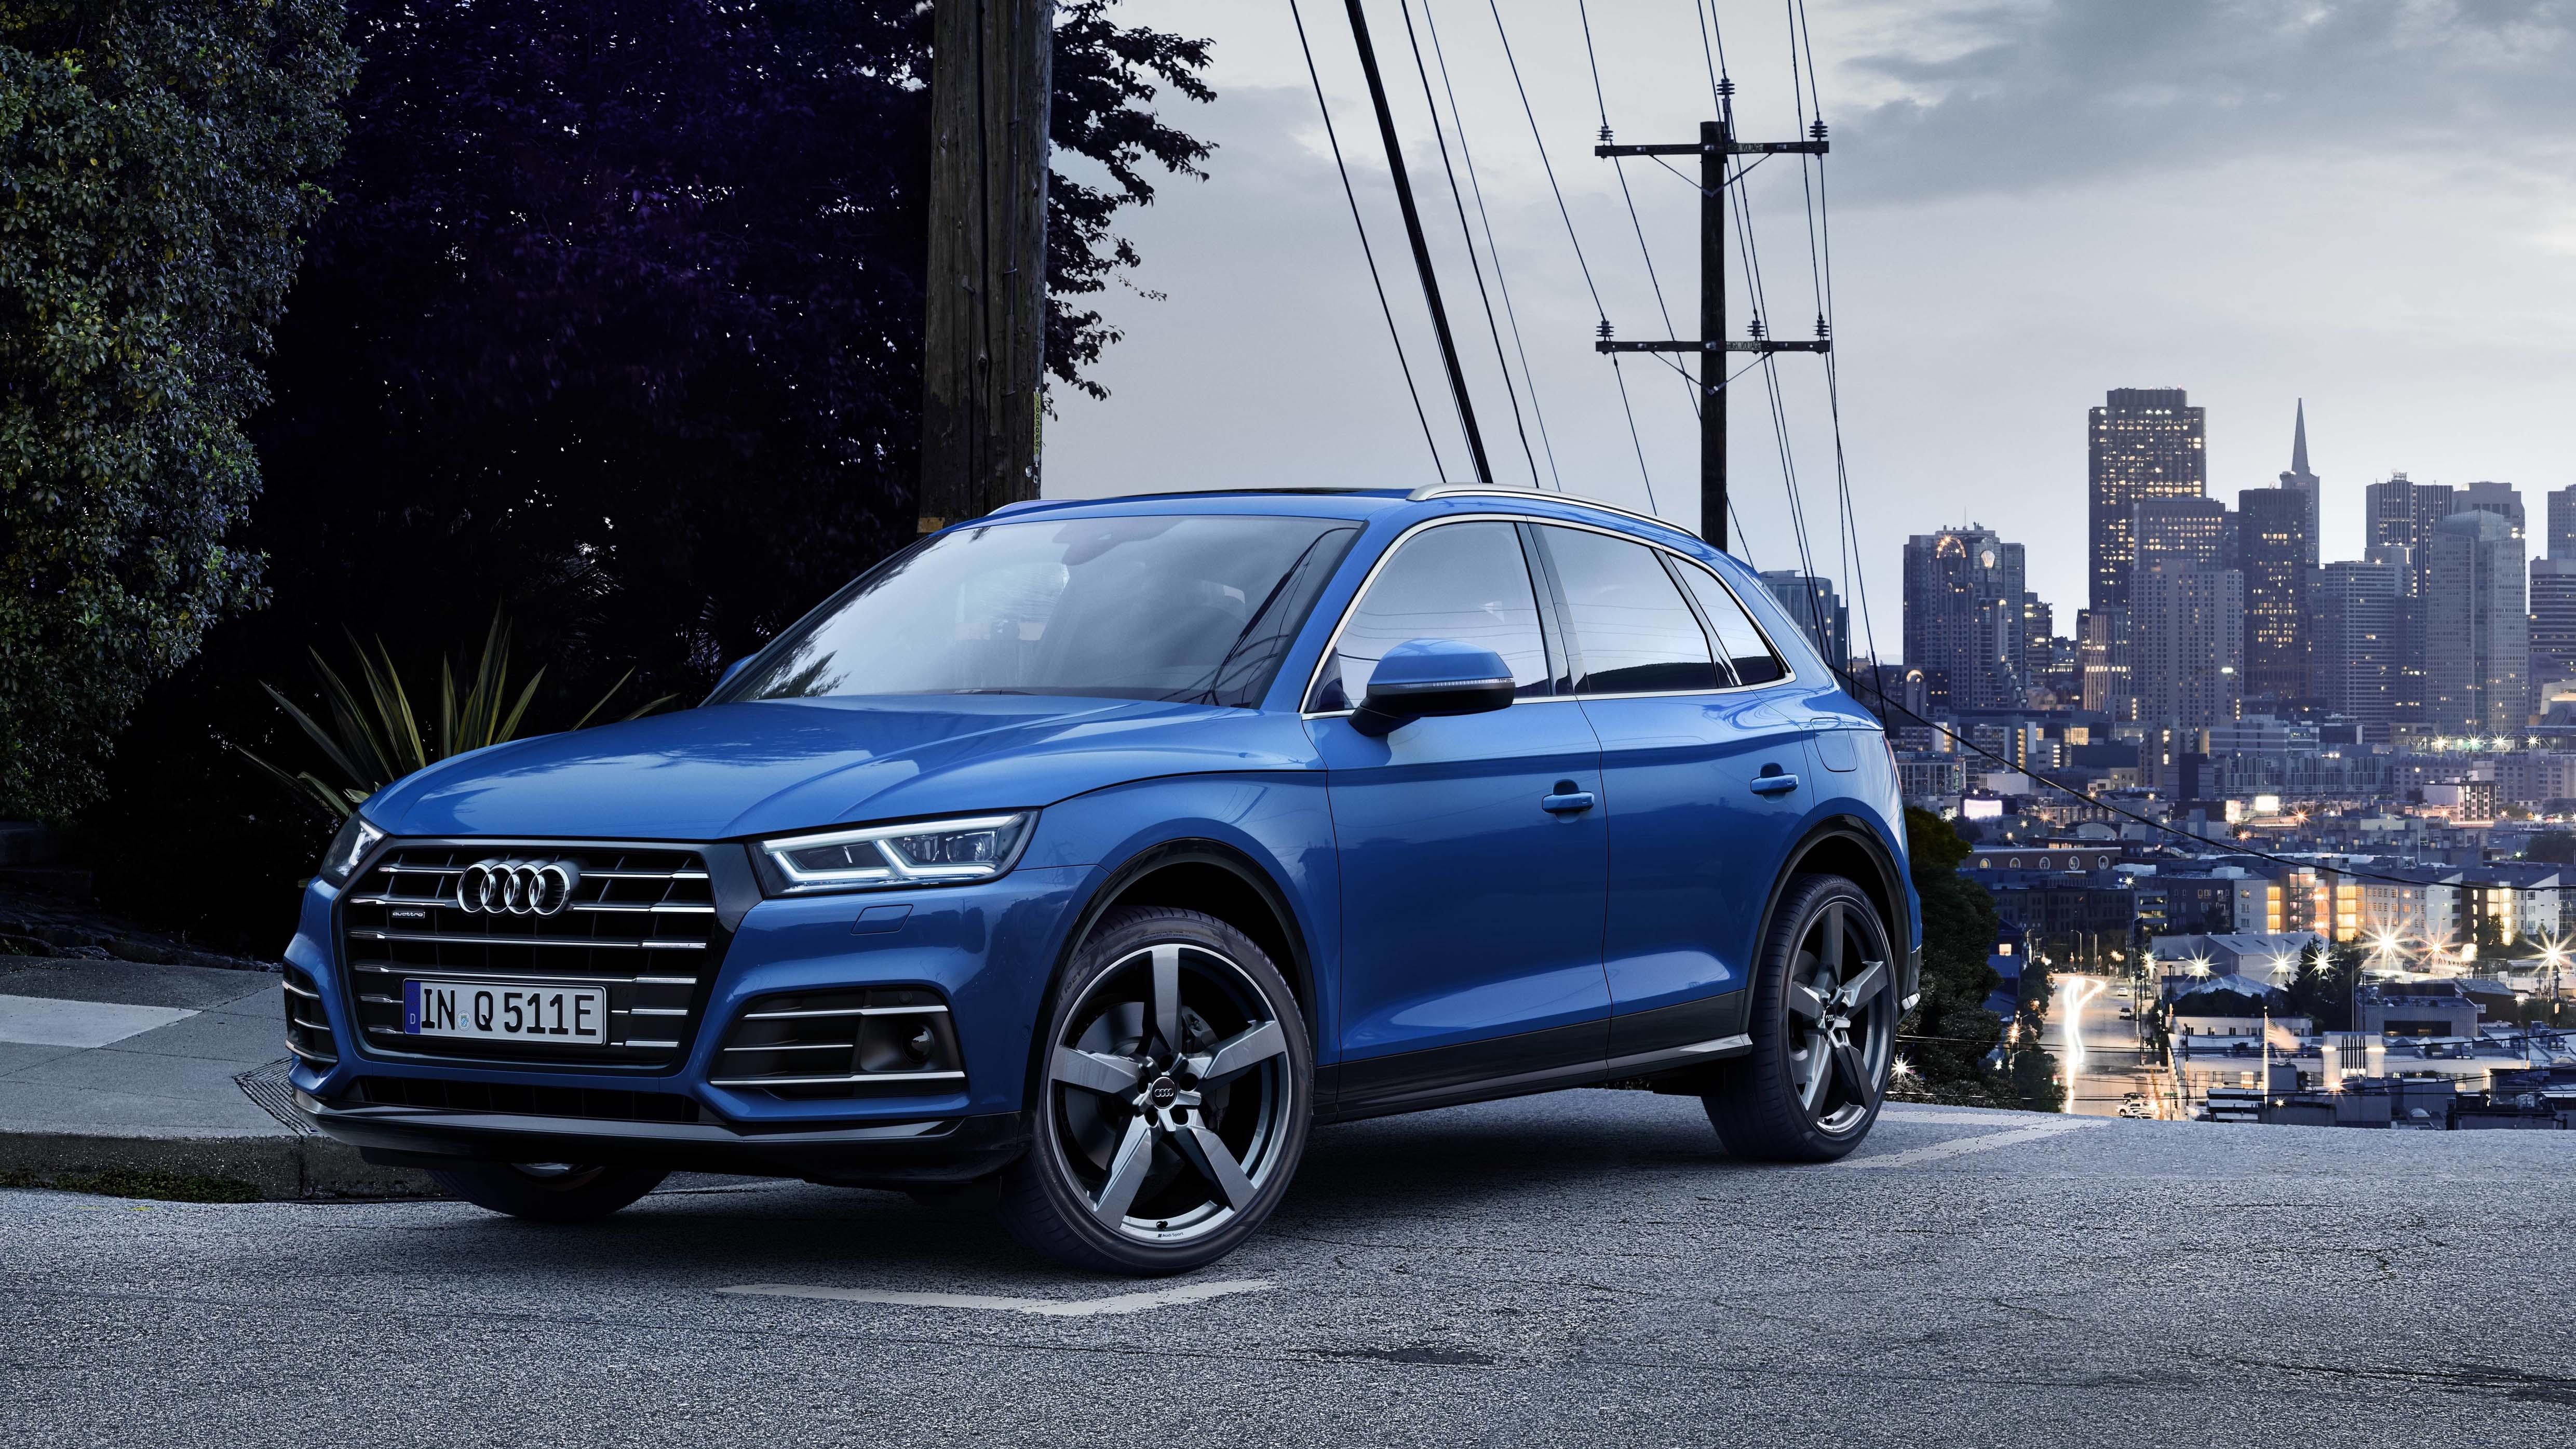 New 2019 Audi Q5 Hybrid Tfsi E Pics Prices And Performance Buyacar